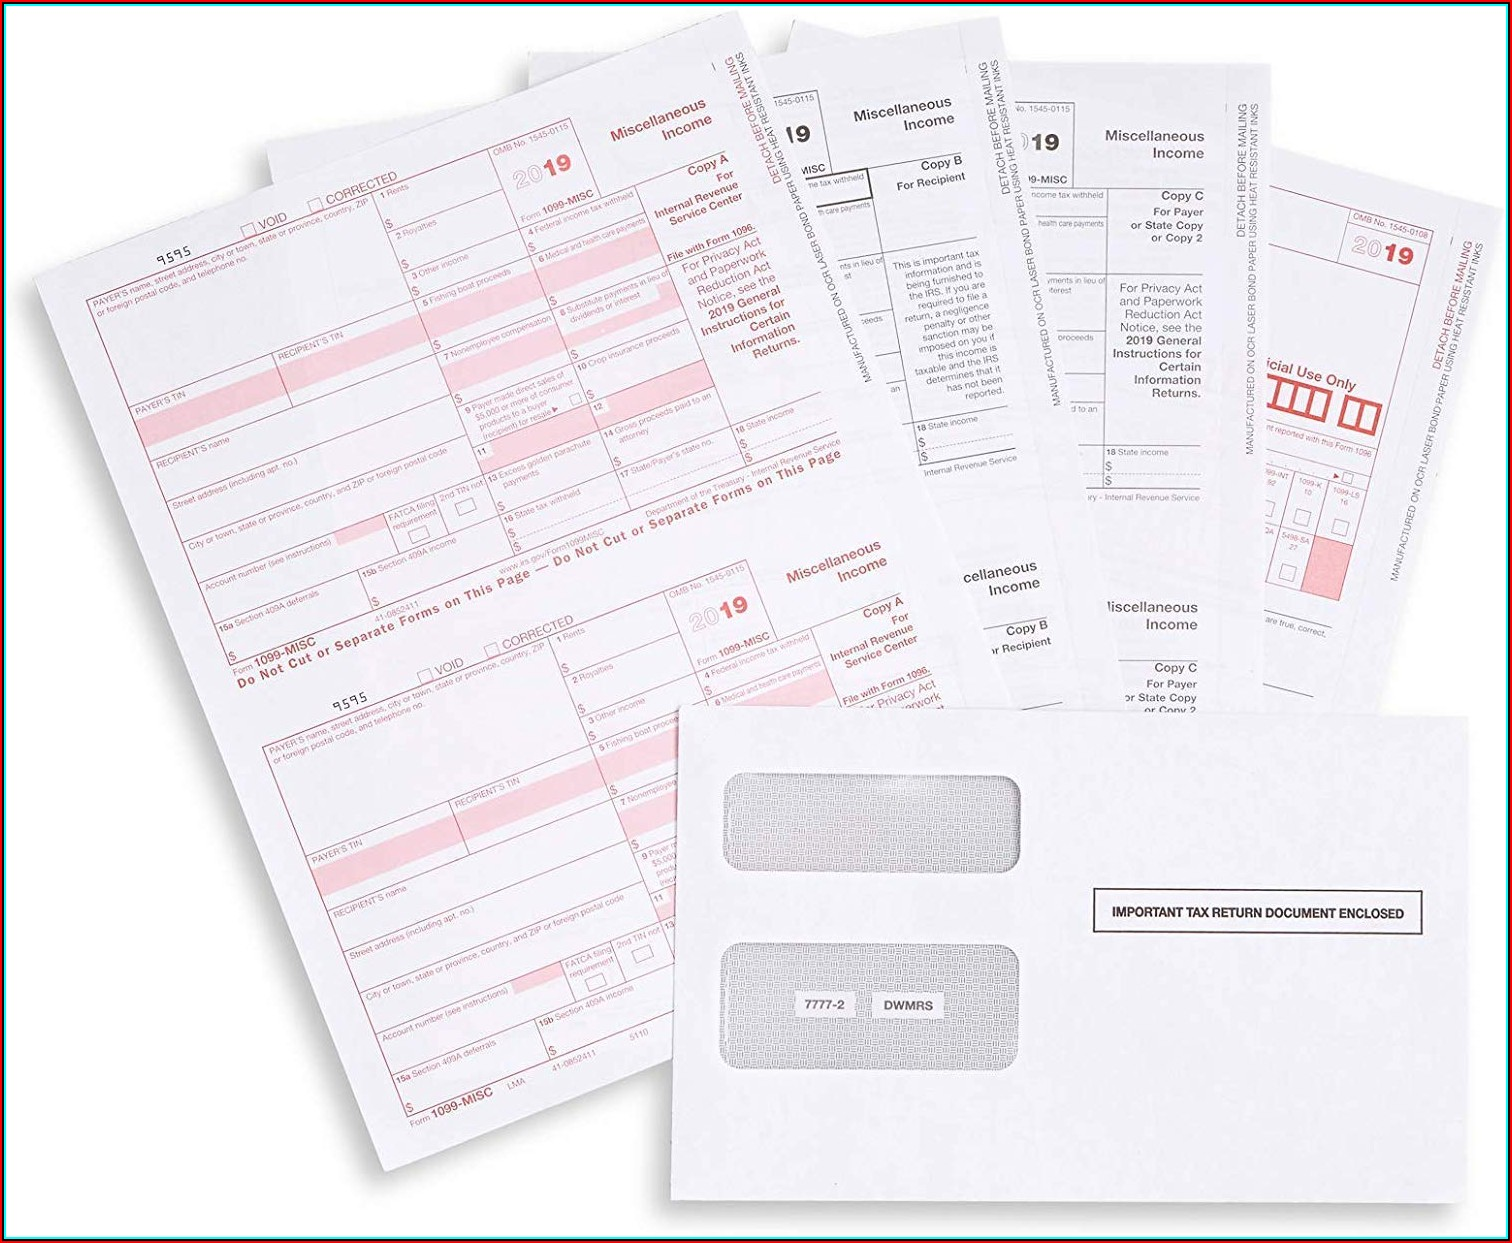 1099 Misc Tax Form 2019